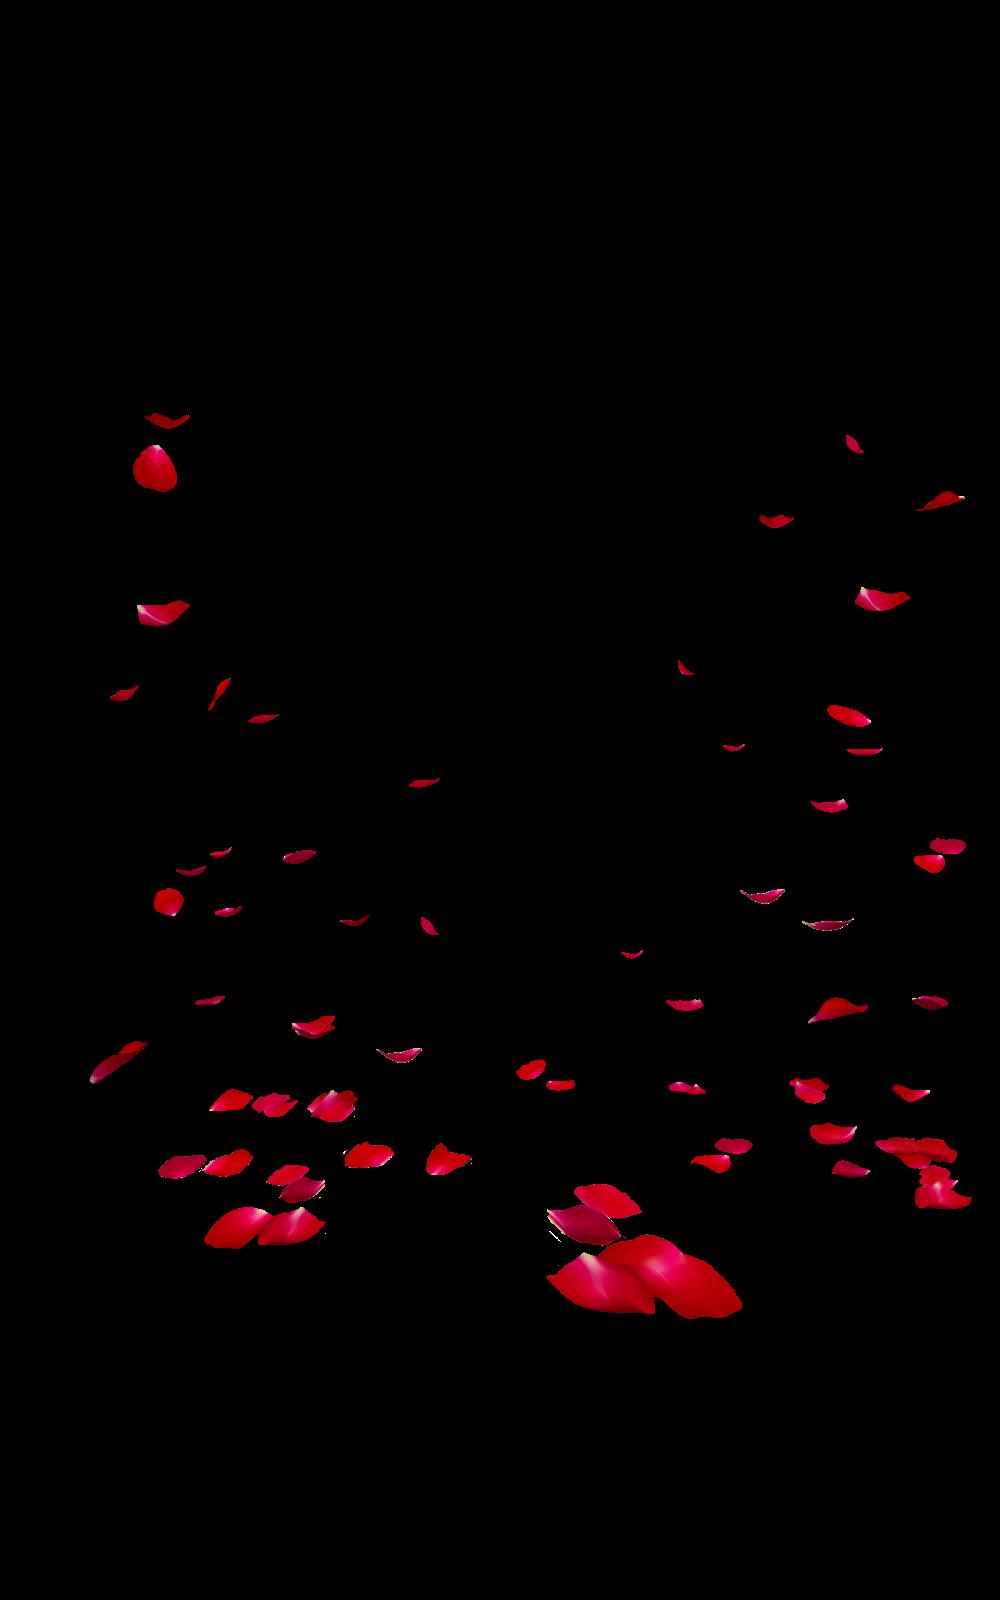 Falling Rose Petals Transparent Images PNG